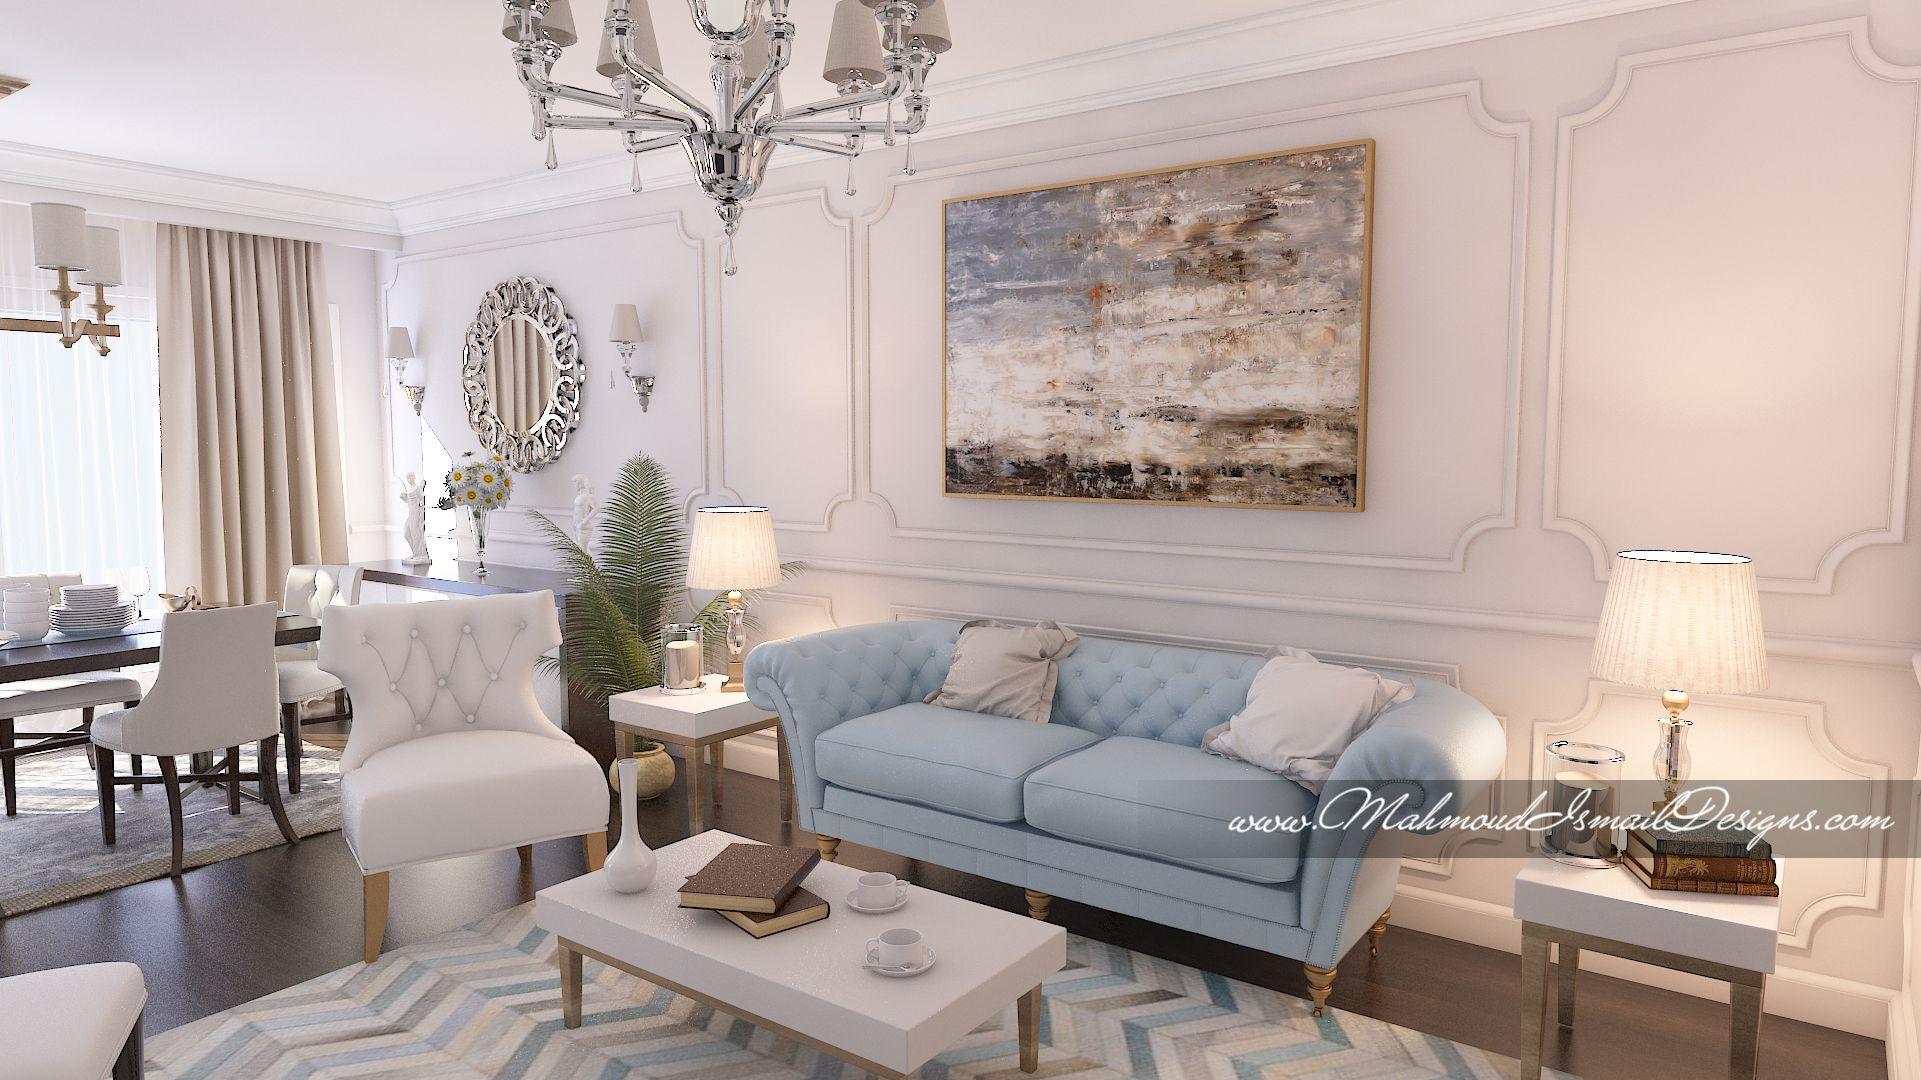 residential contemporary interior design residential contemporary interior